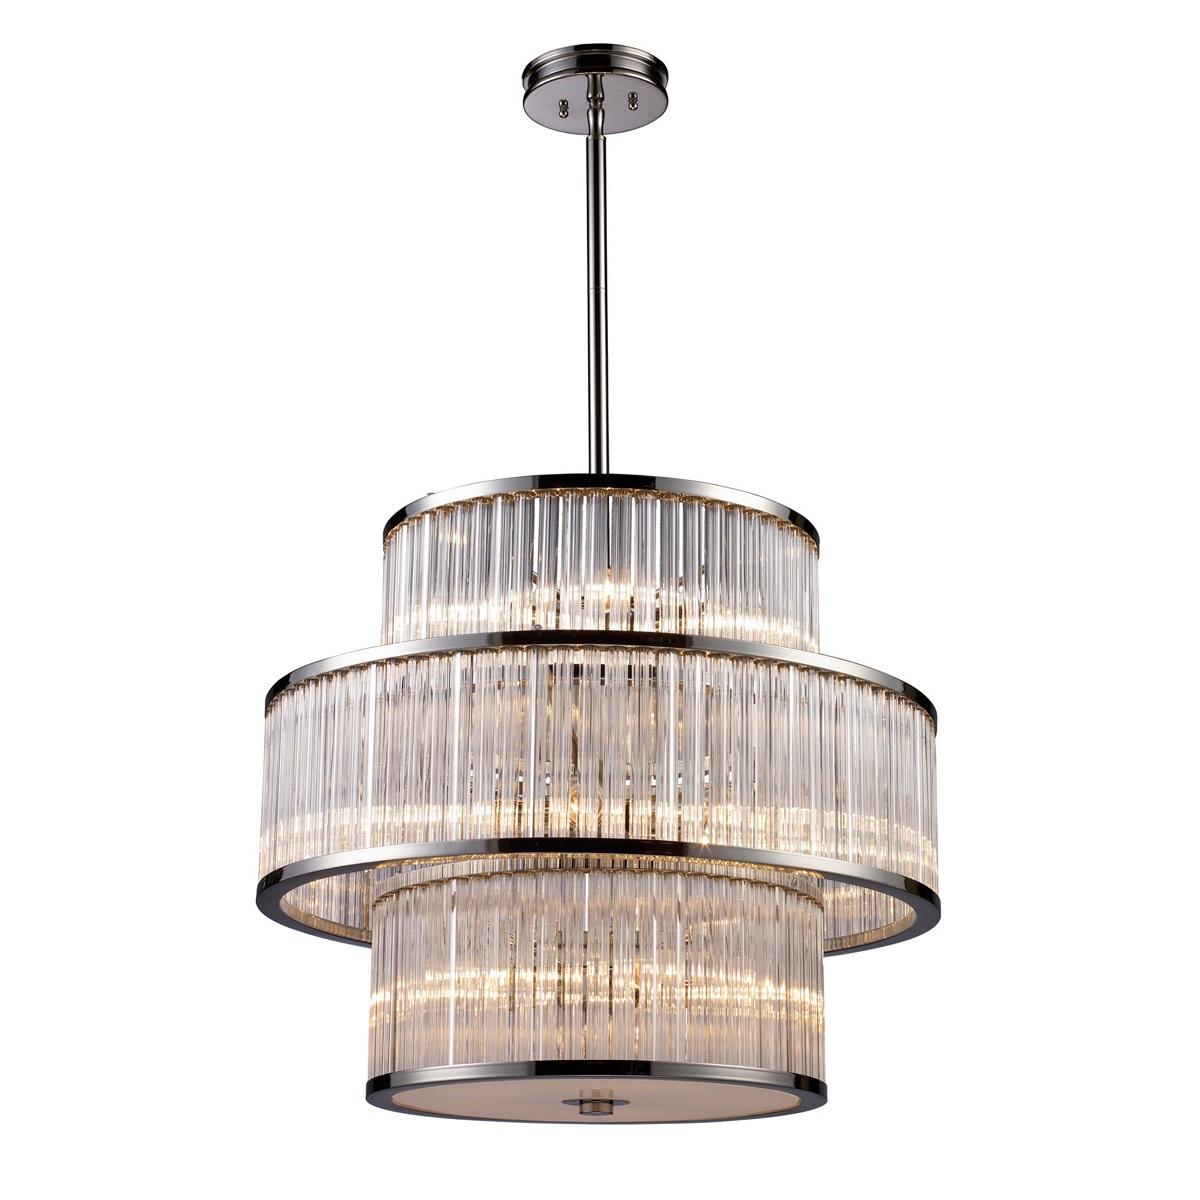 ELK Lighting Pendant Lighting, Accentuations Brand, Furniture by ABD